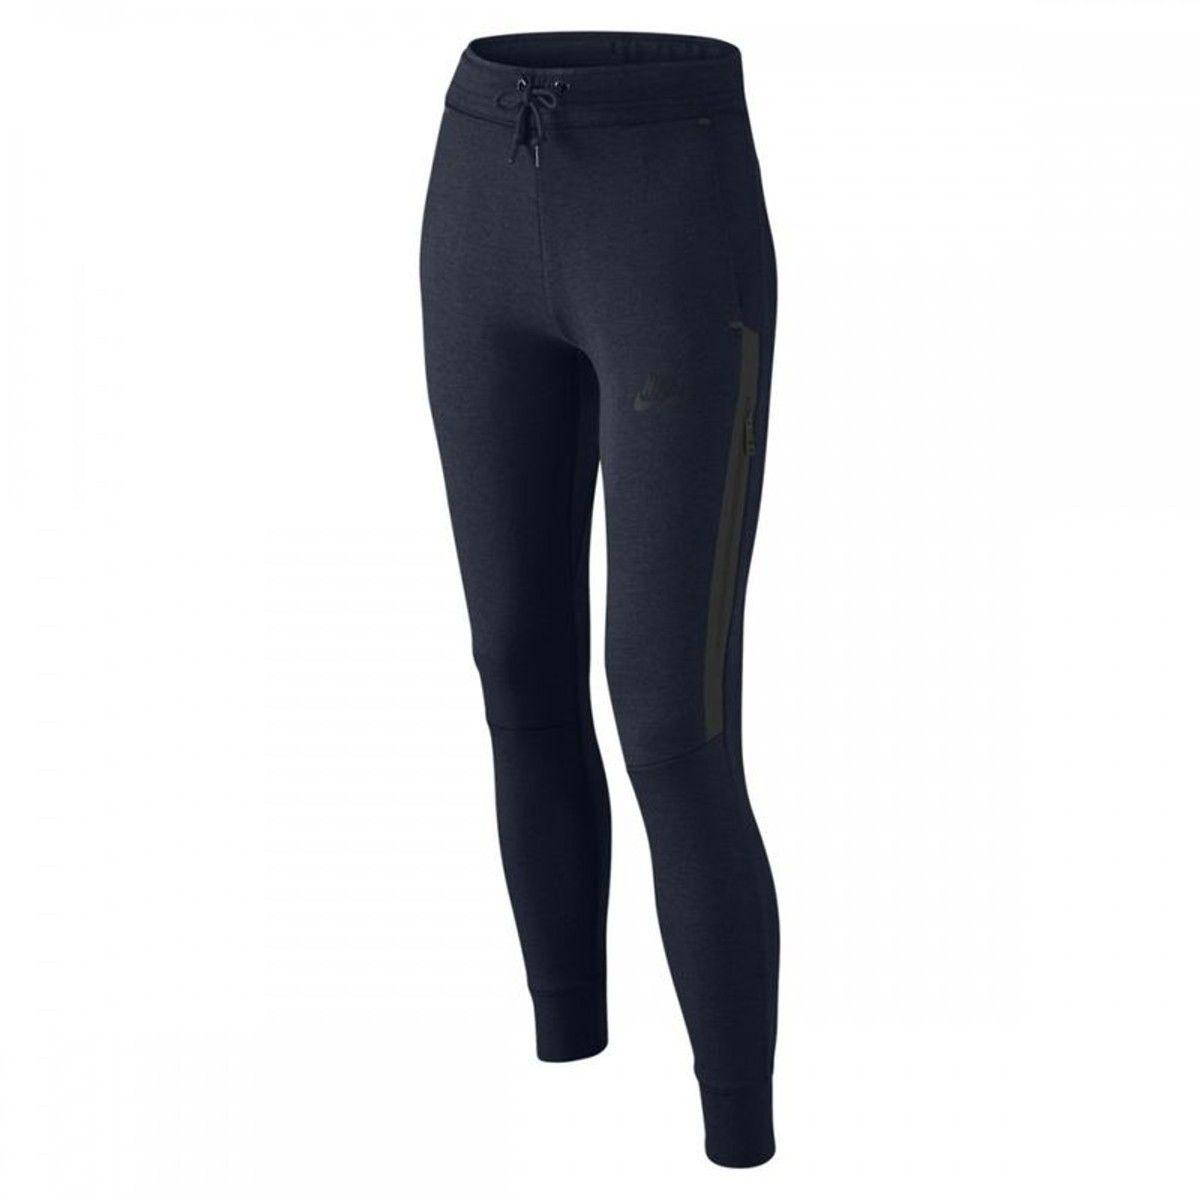 Pantalon De Survêtement Nike Junior Tech Fleece 807565 473